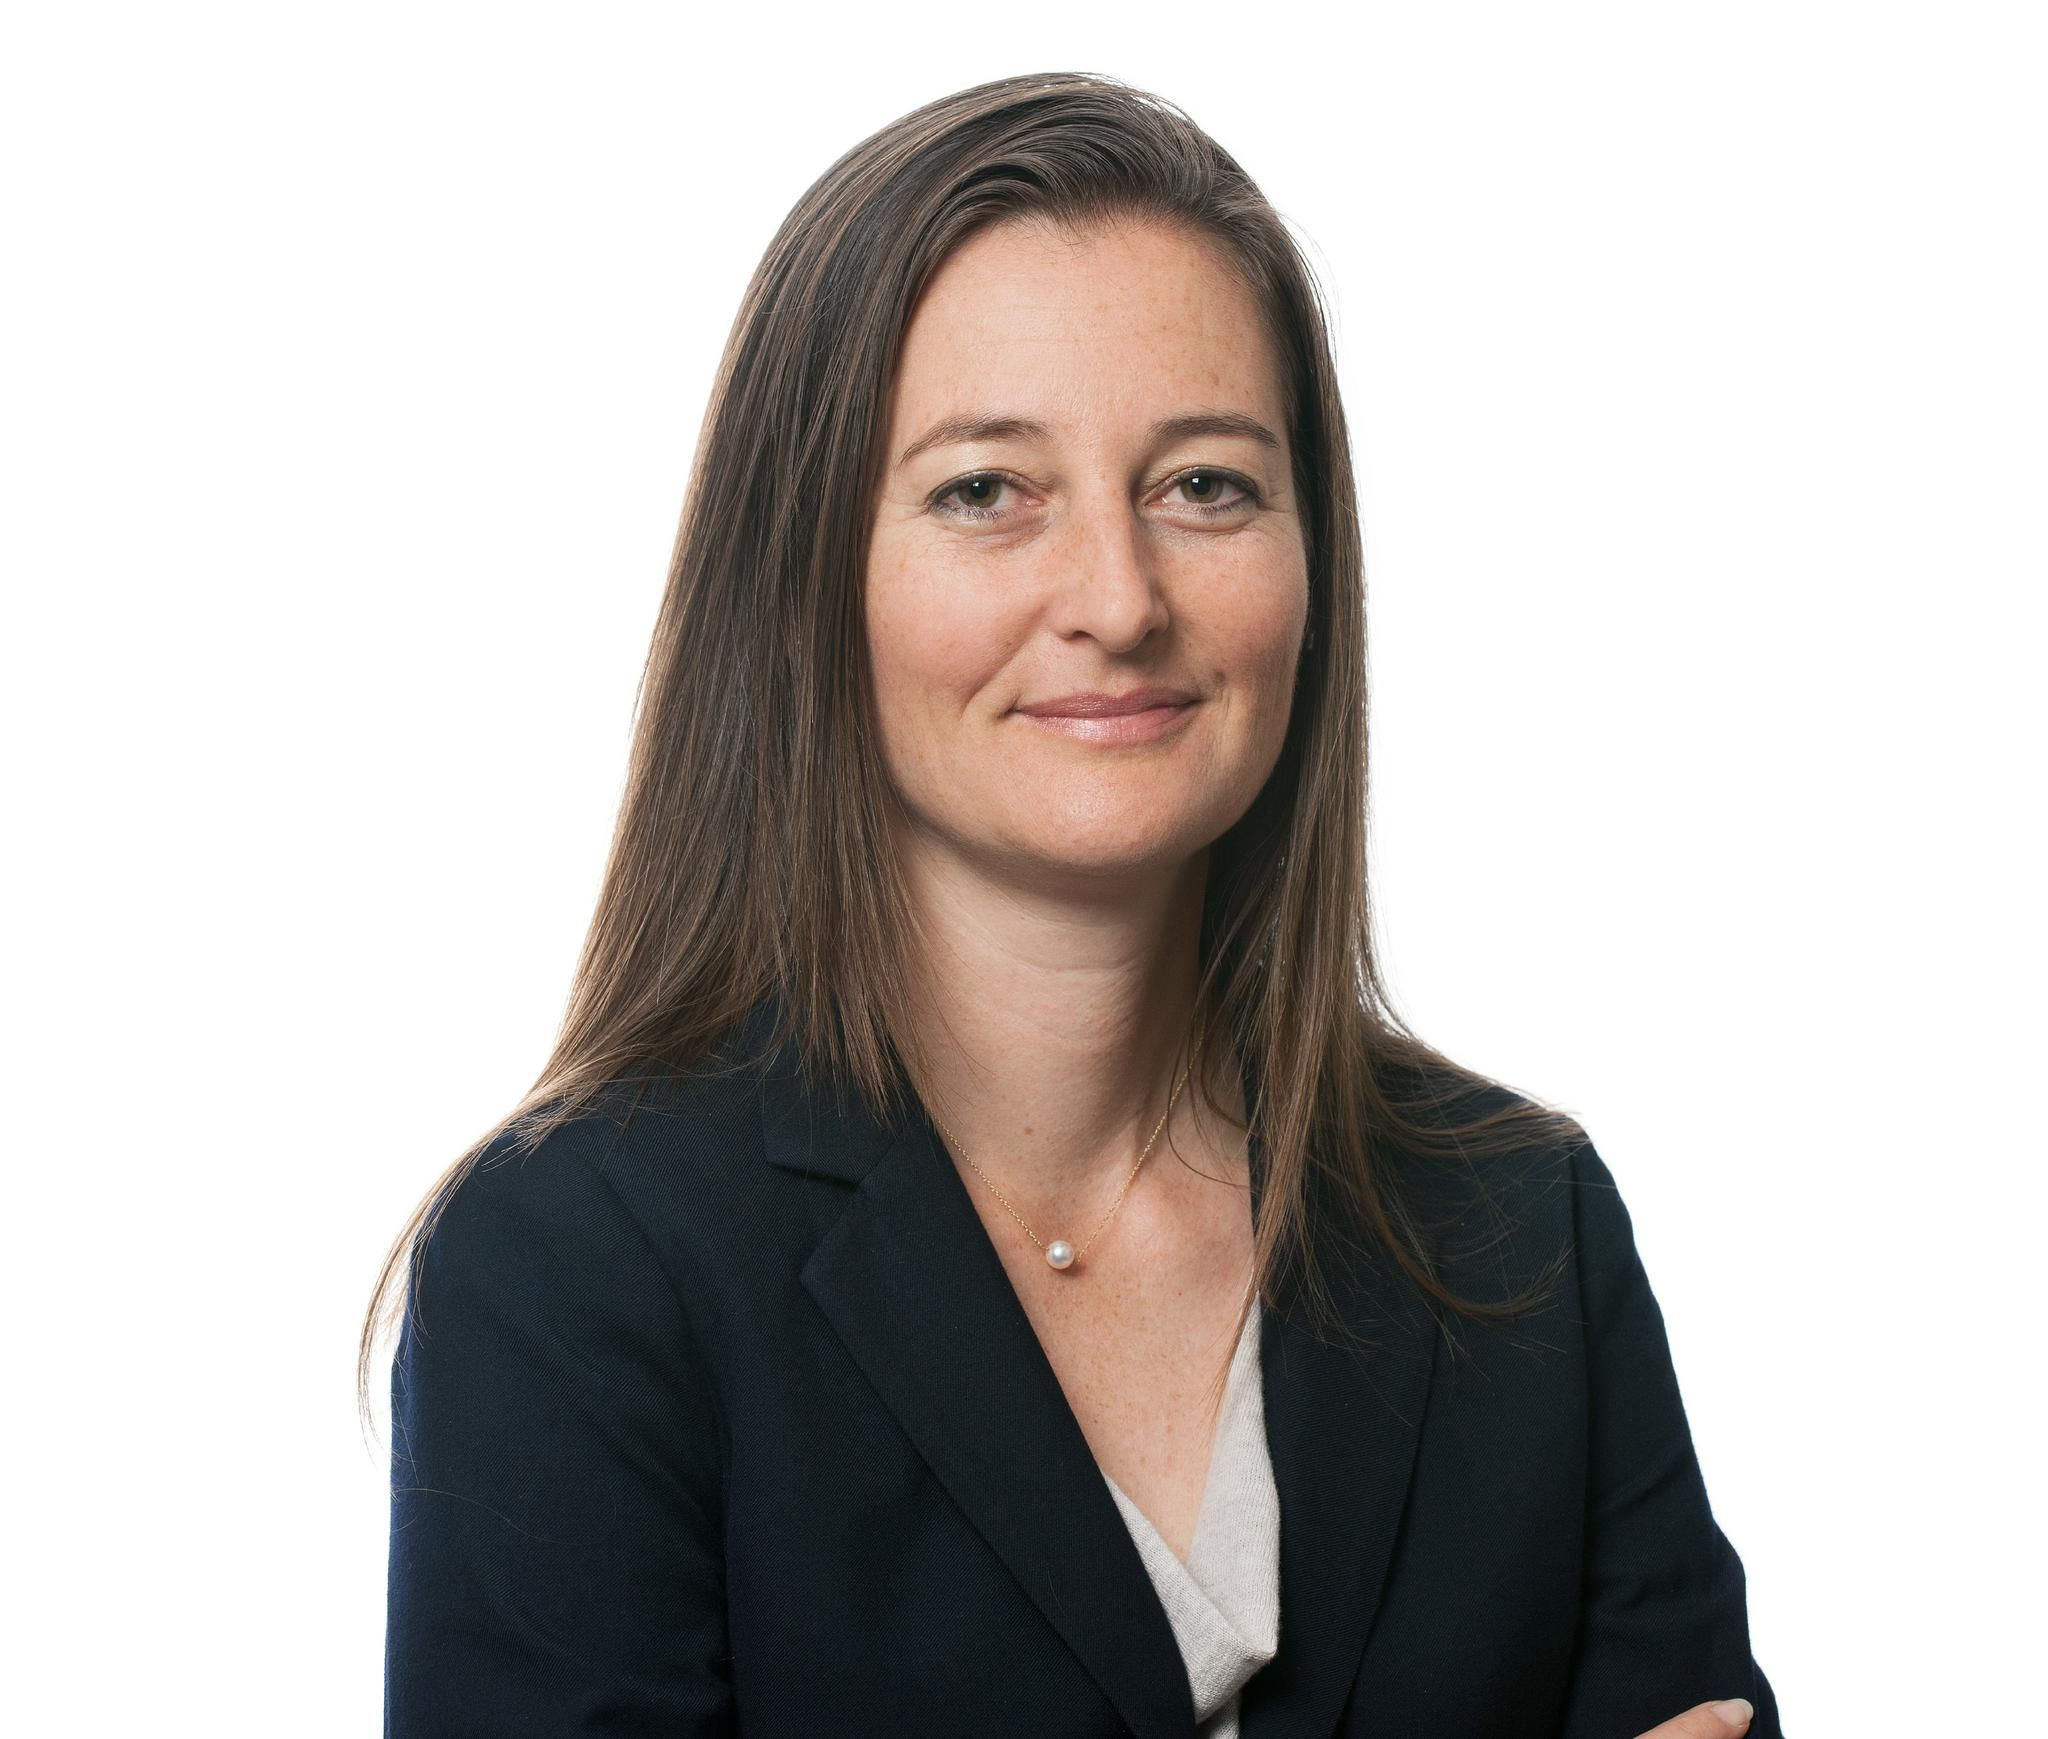 Charlene Marini